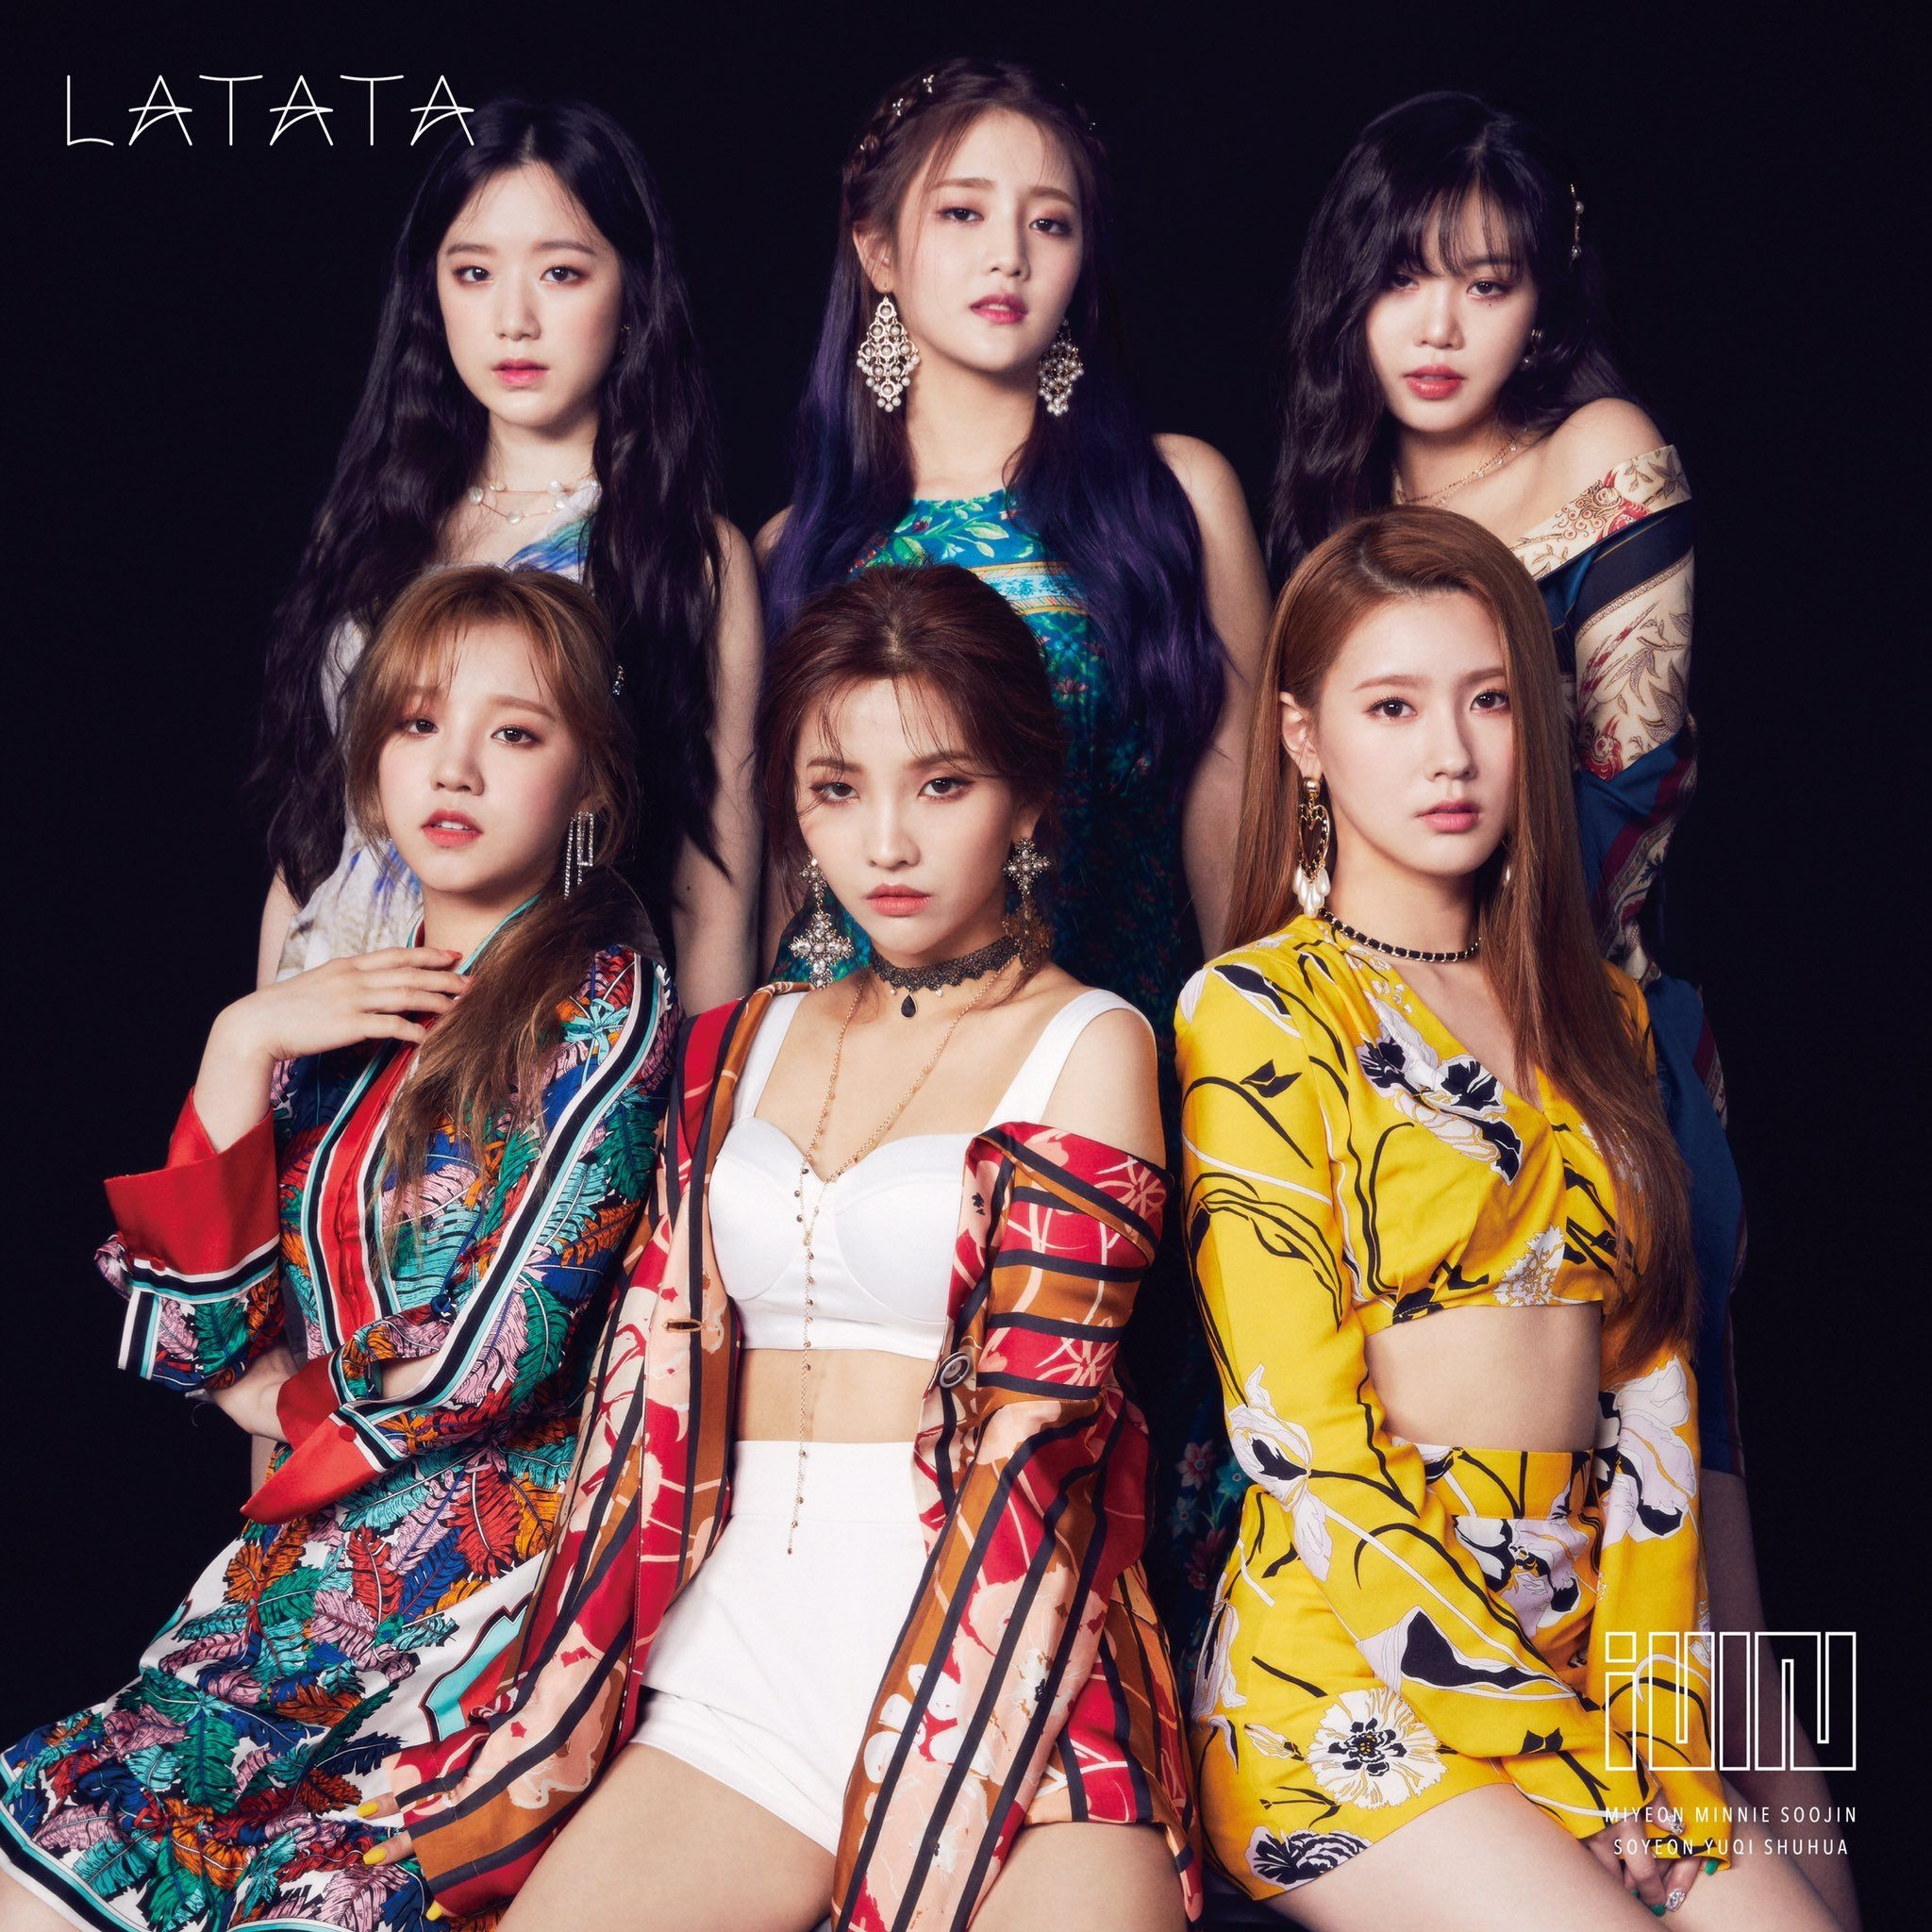 Latata Japanese Version 7 31 19 Latata Idle Gidle Kpop Yuqi Soyeon Shuhua Soojin Minnie Miyeon Kpop Girls Kpop Girl Groups Kpop